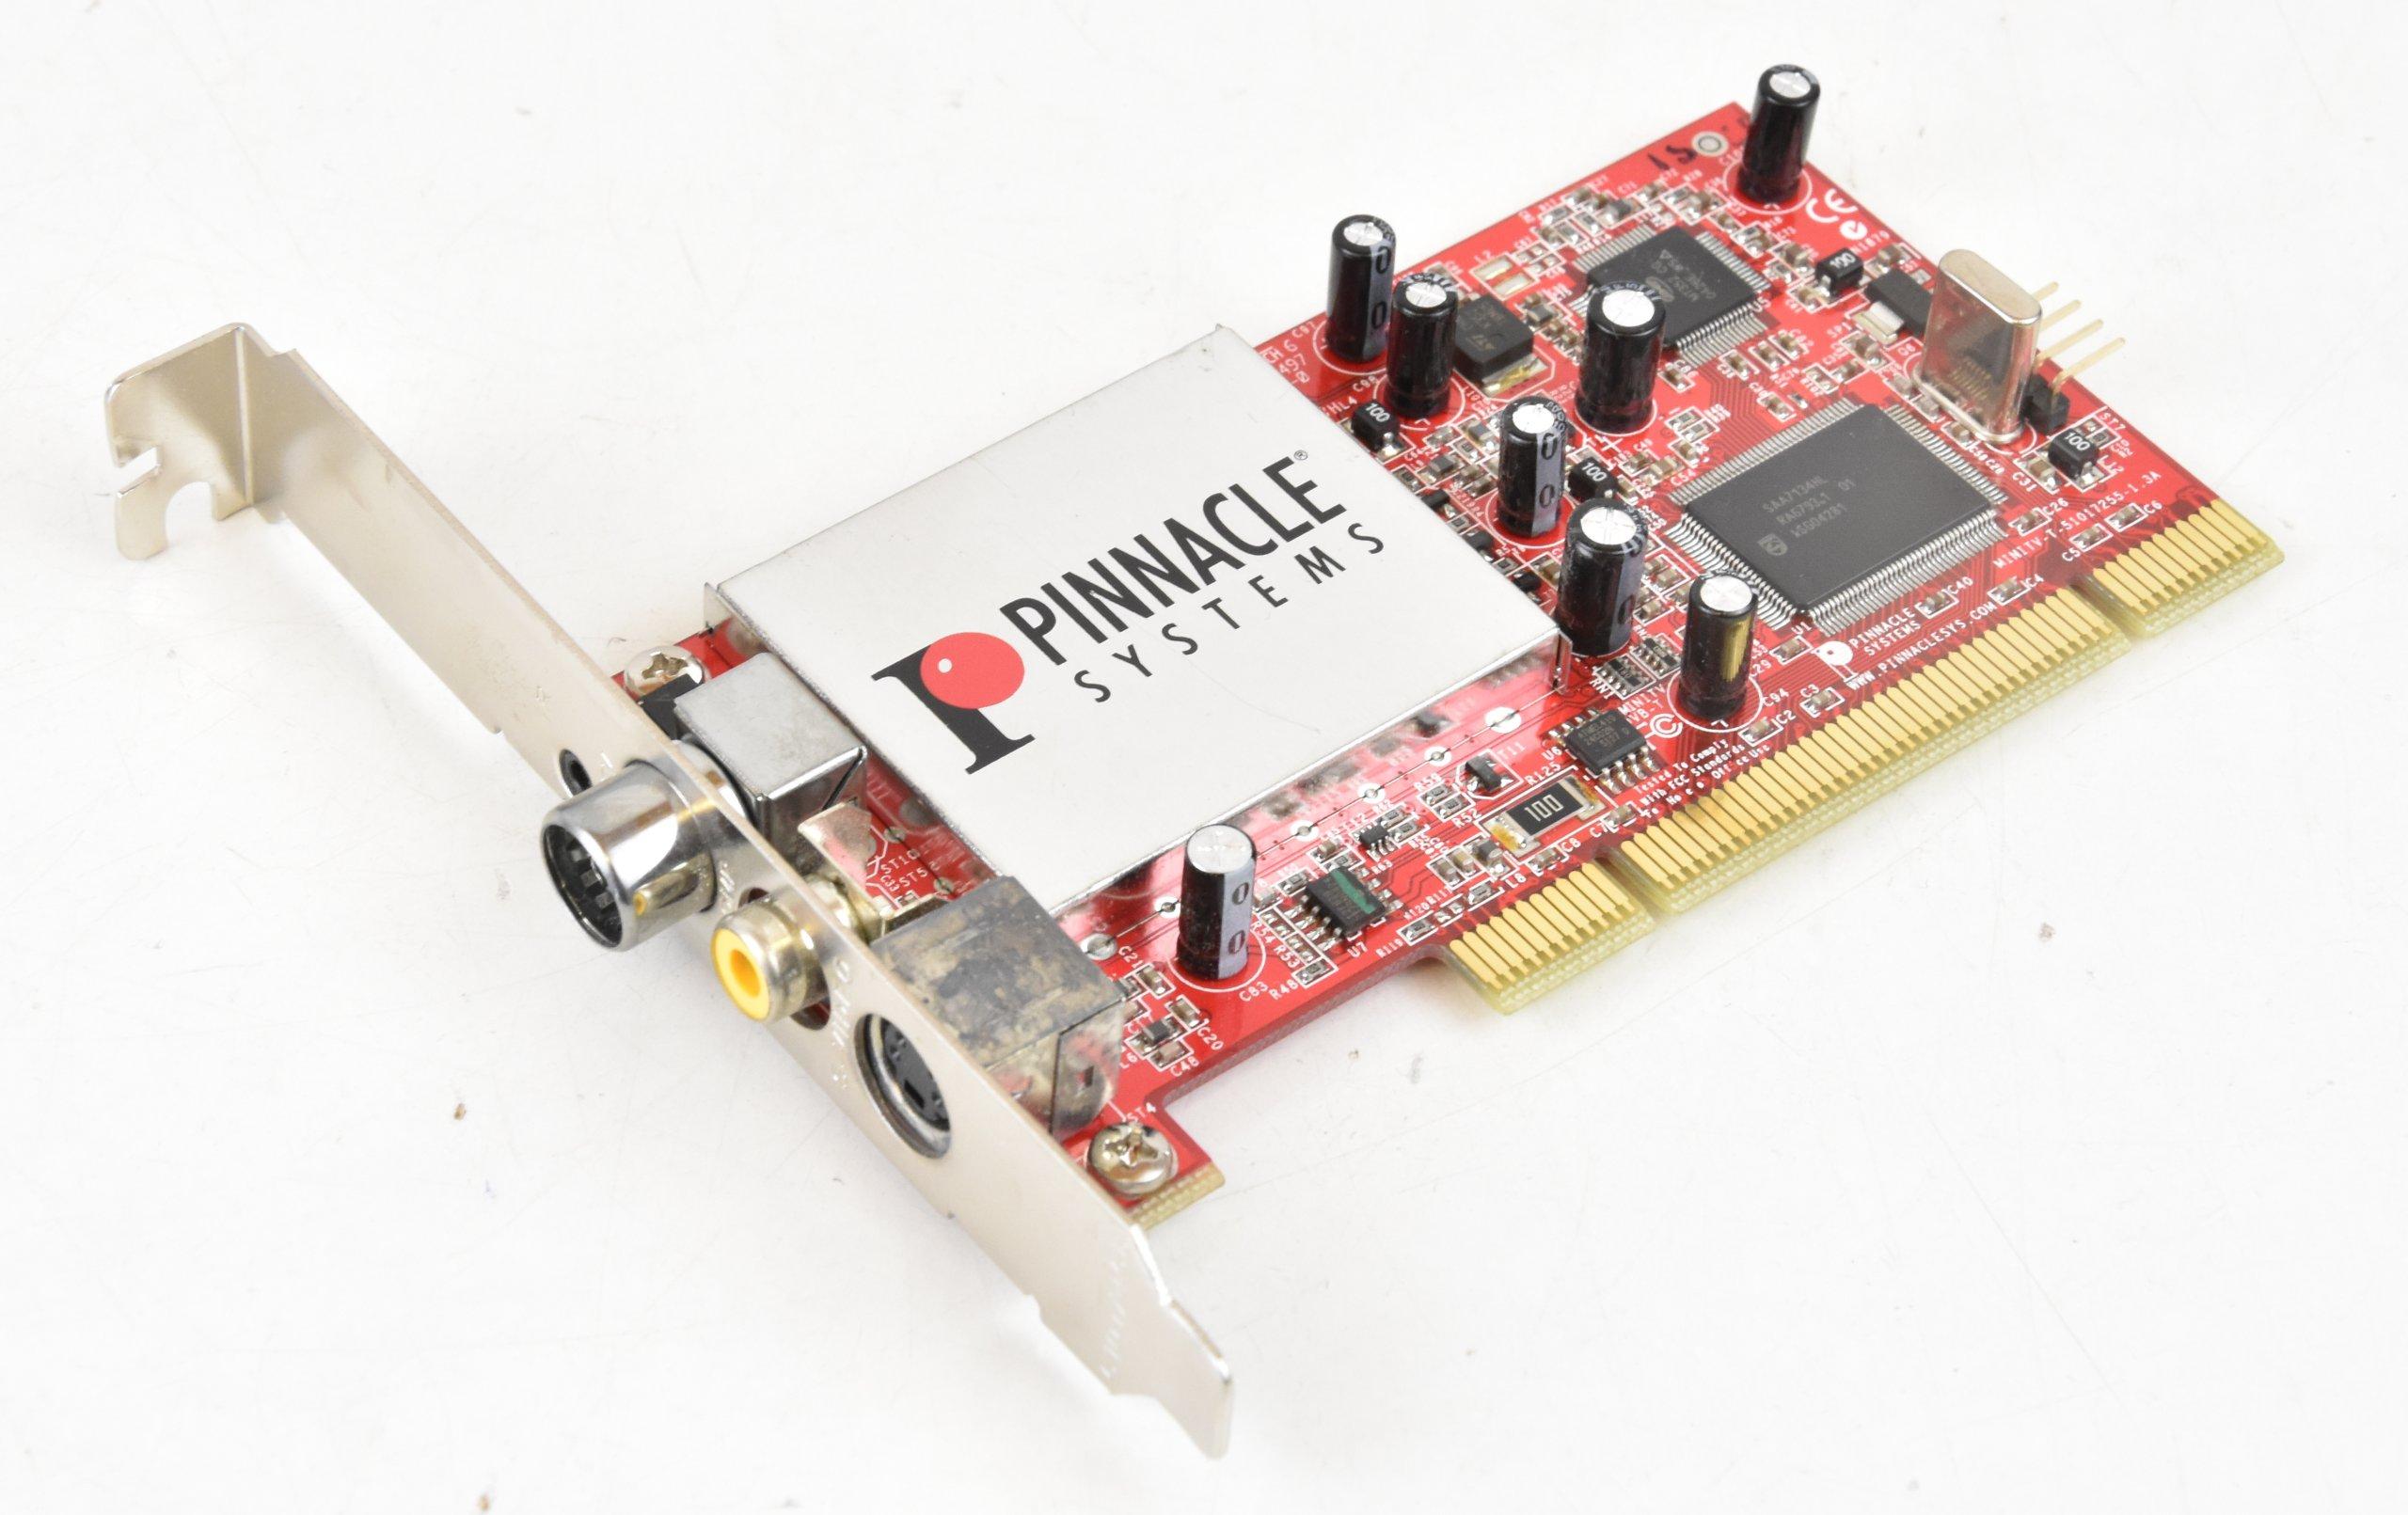 DRIVERS: PINNACLE PCTV 300I